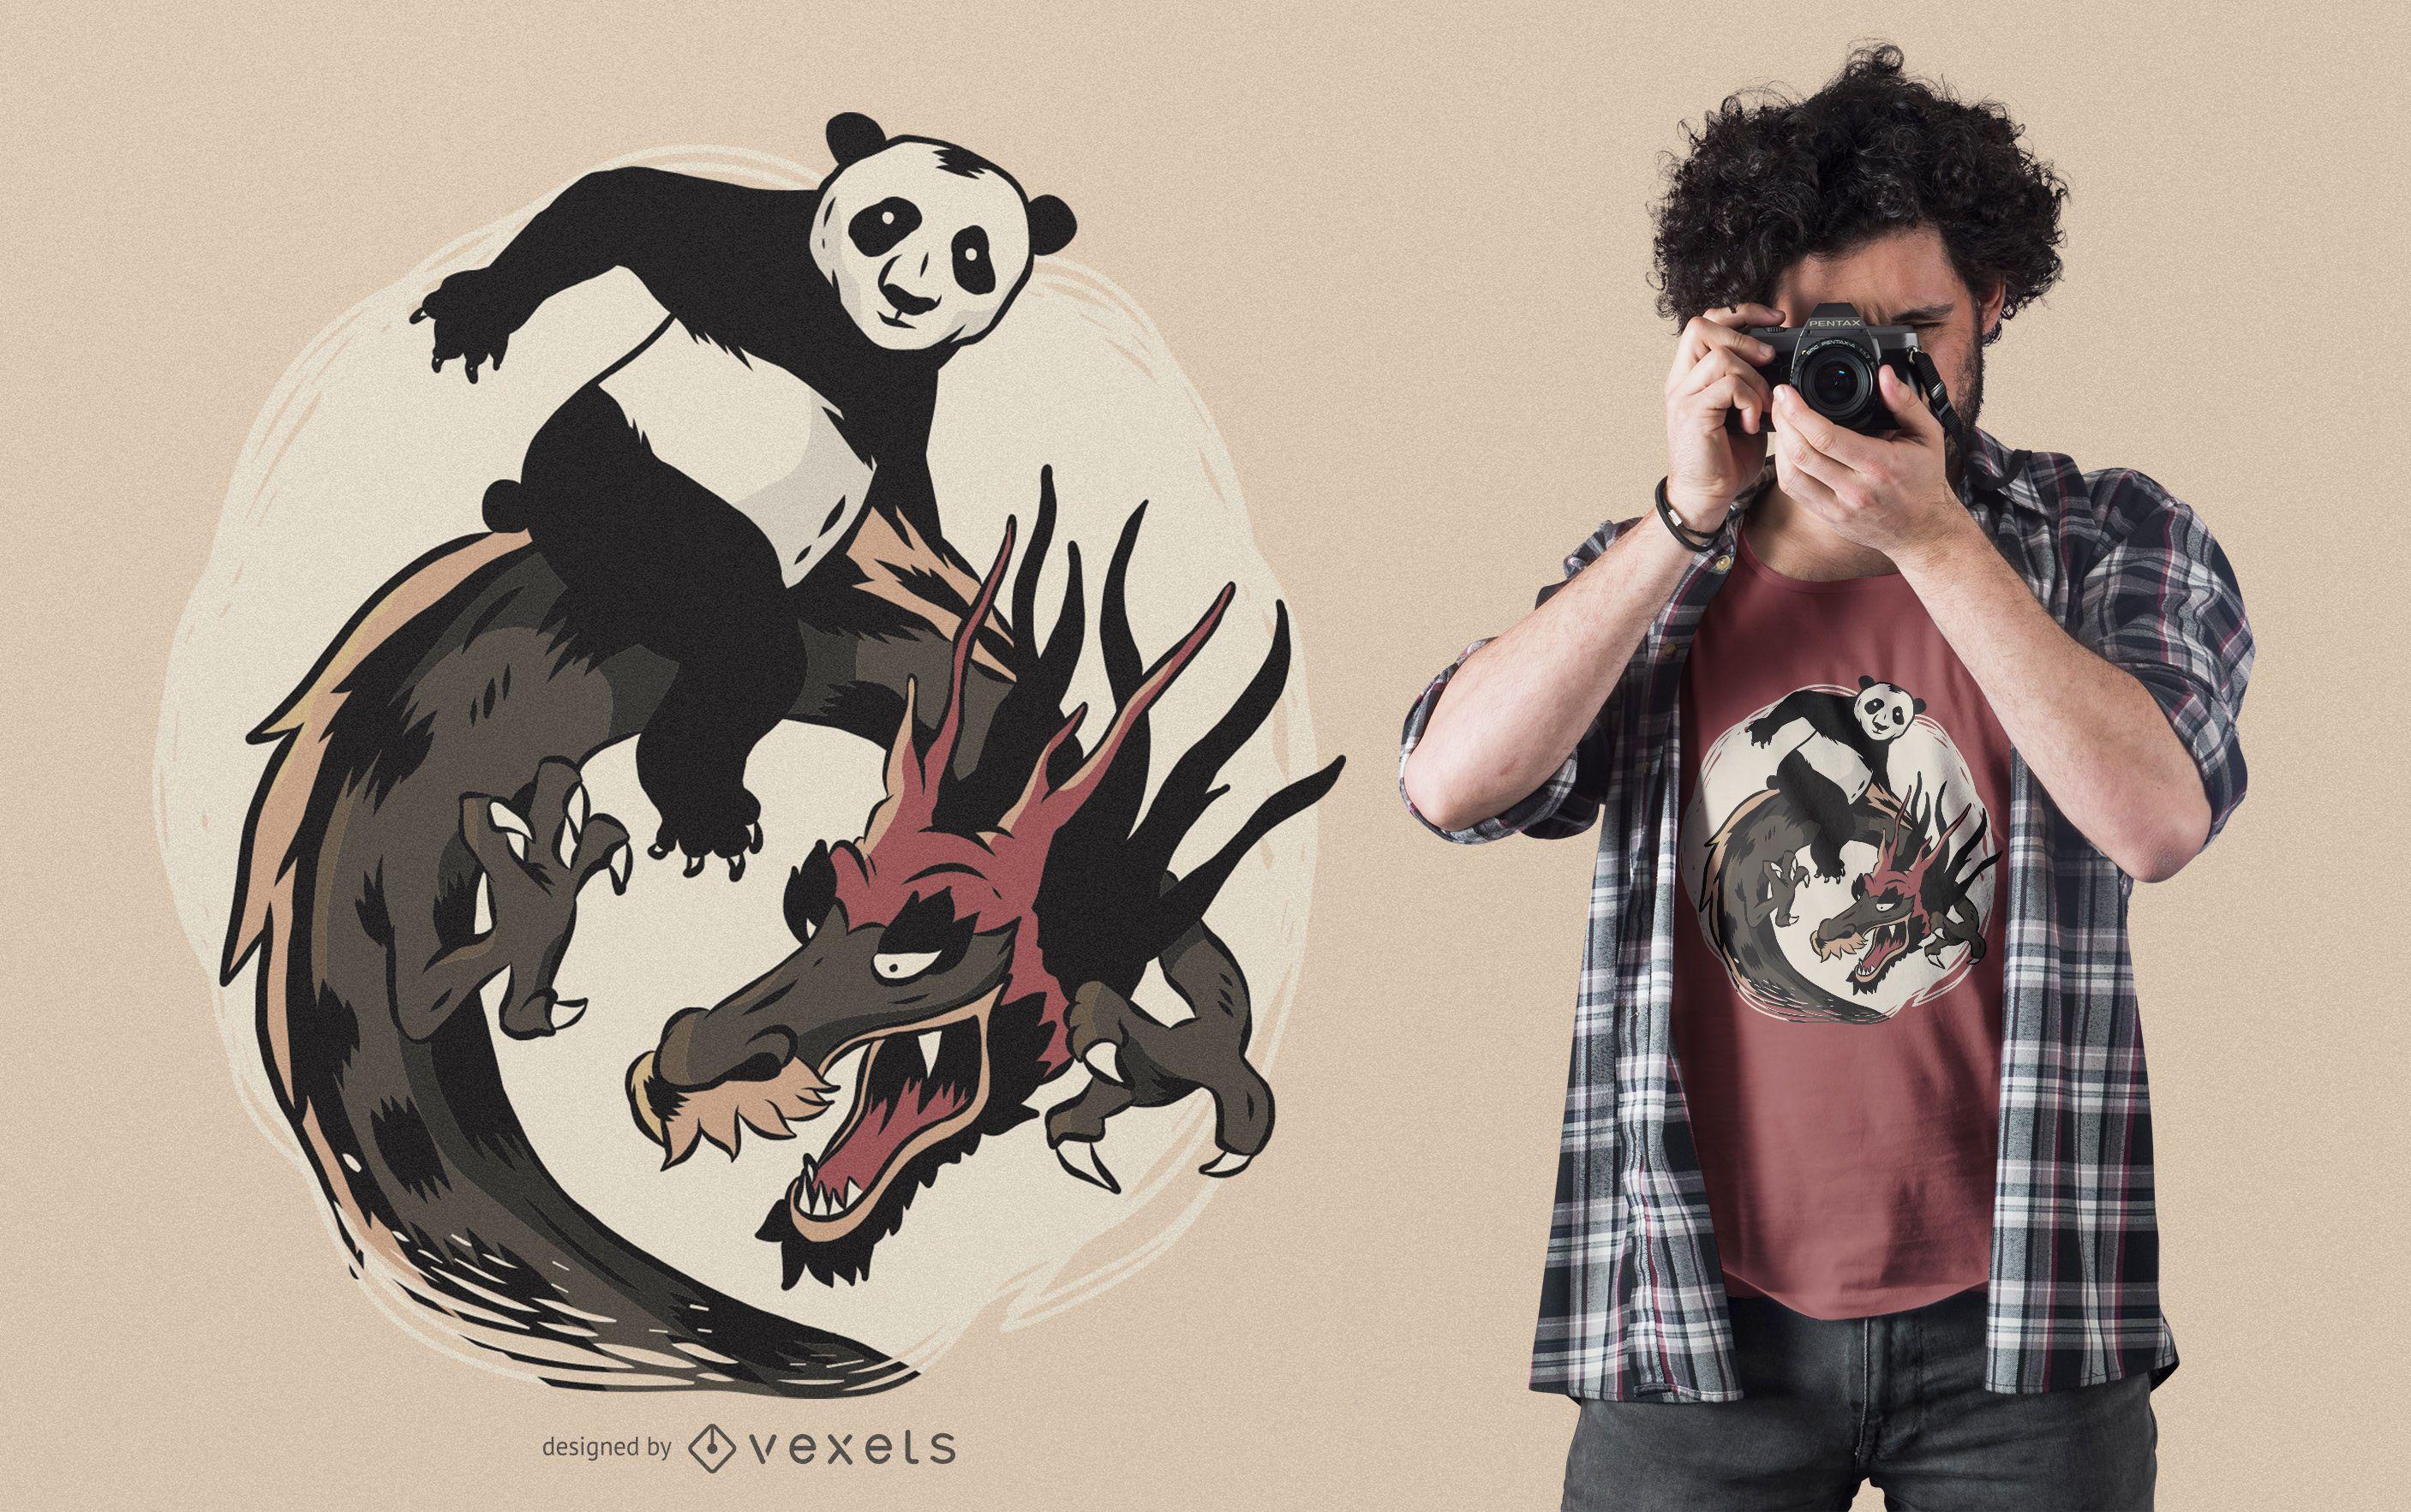 Panda riding dragon t-shirt design